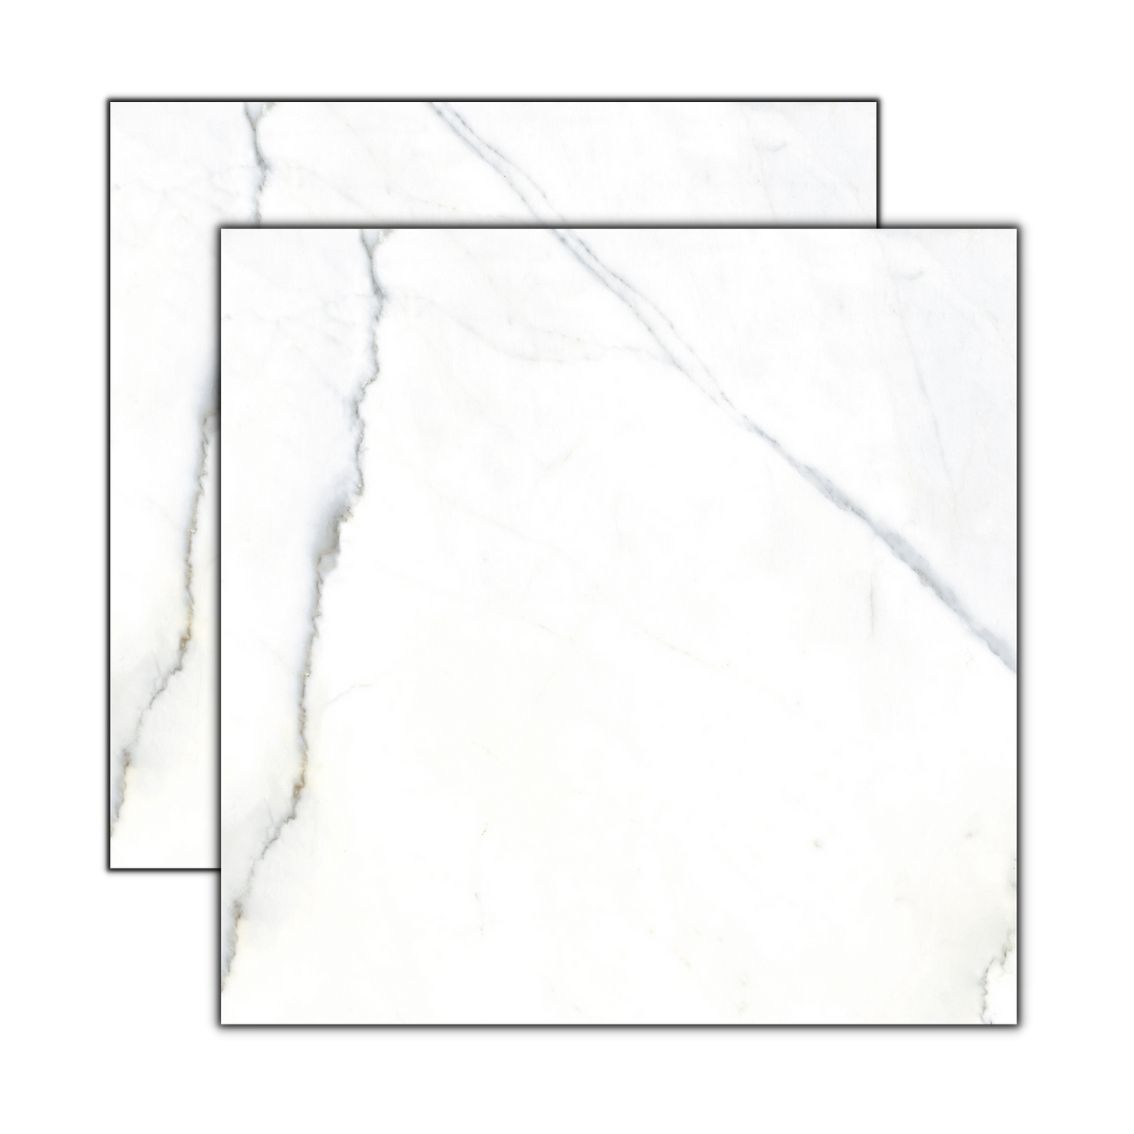 Calacata Ice In 84x84 cm <br /><b>R$ 69,90 M² </b><br />Cx 2,80 M² <b> R$ 195,72</b>